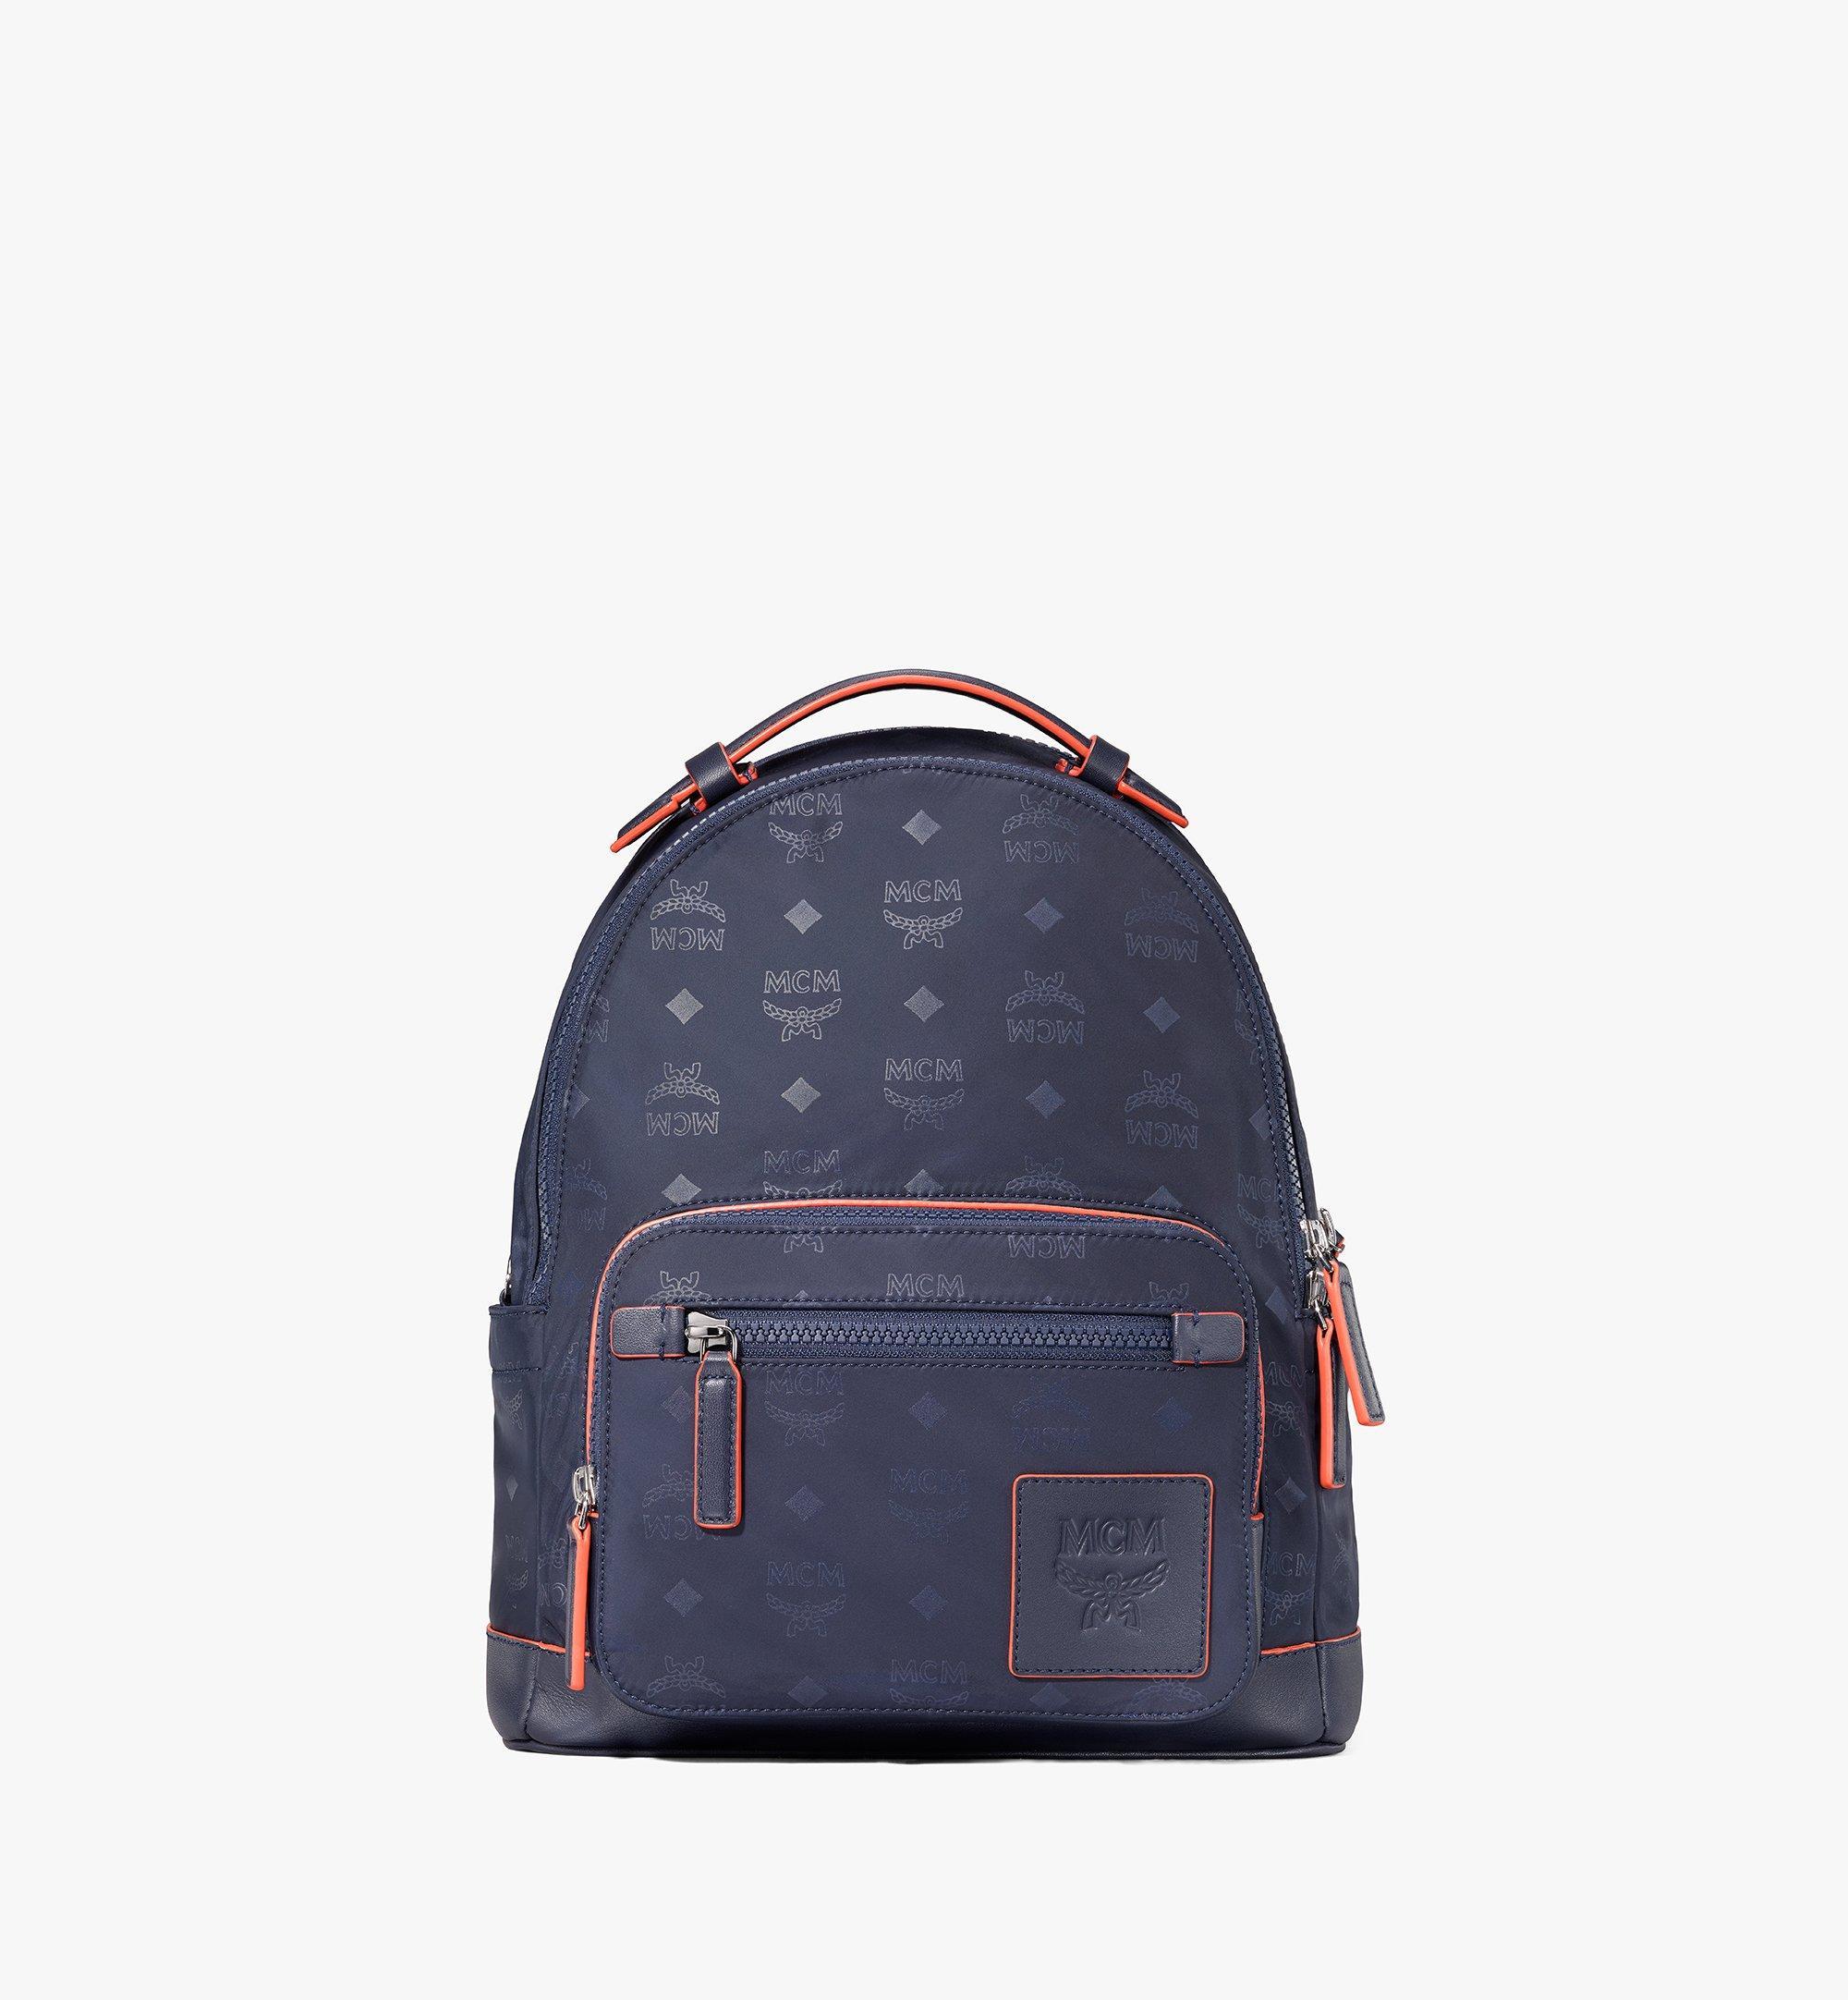 MCM Stark Backpack in Monogram Nylon Navy MMKASVE25VA001 Alternate View 1